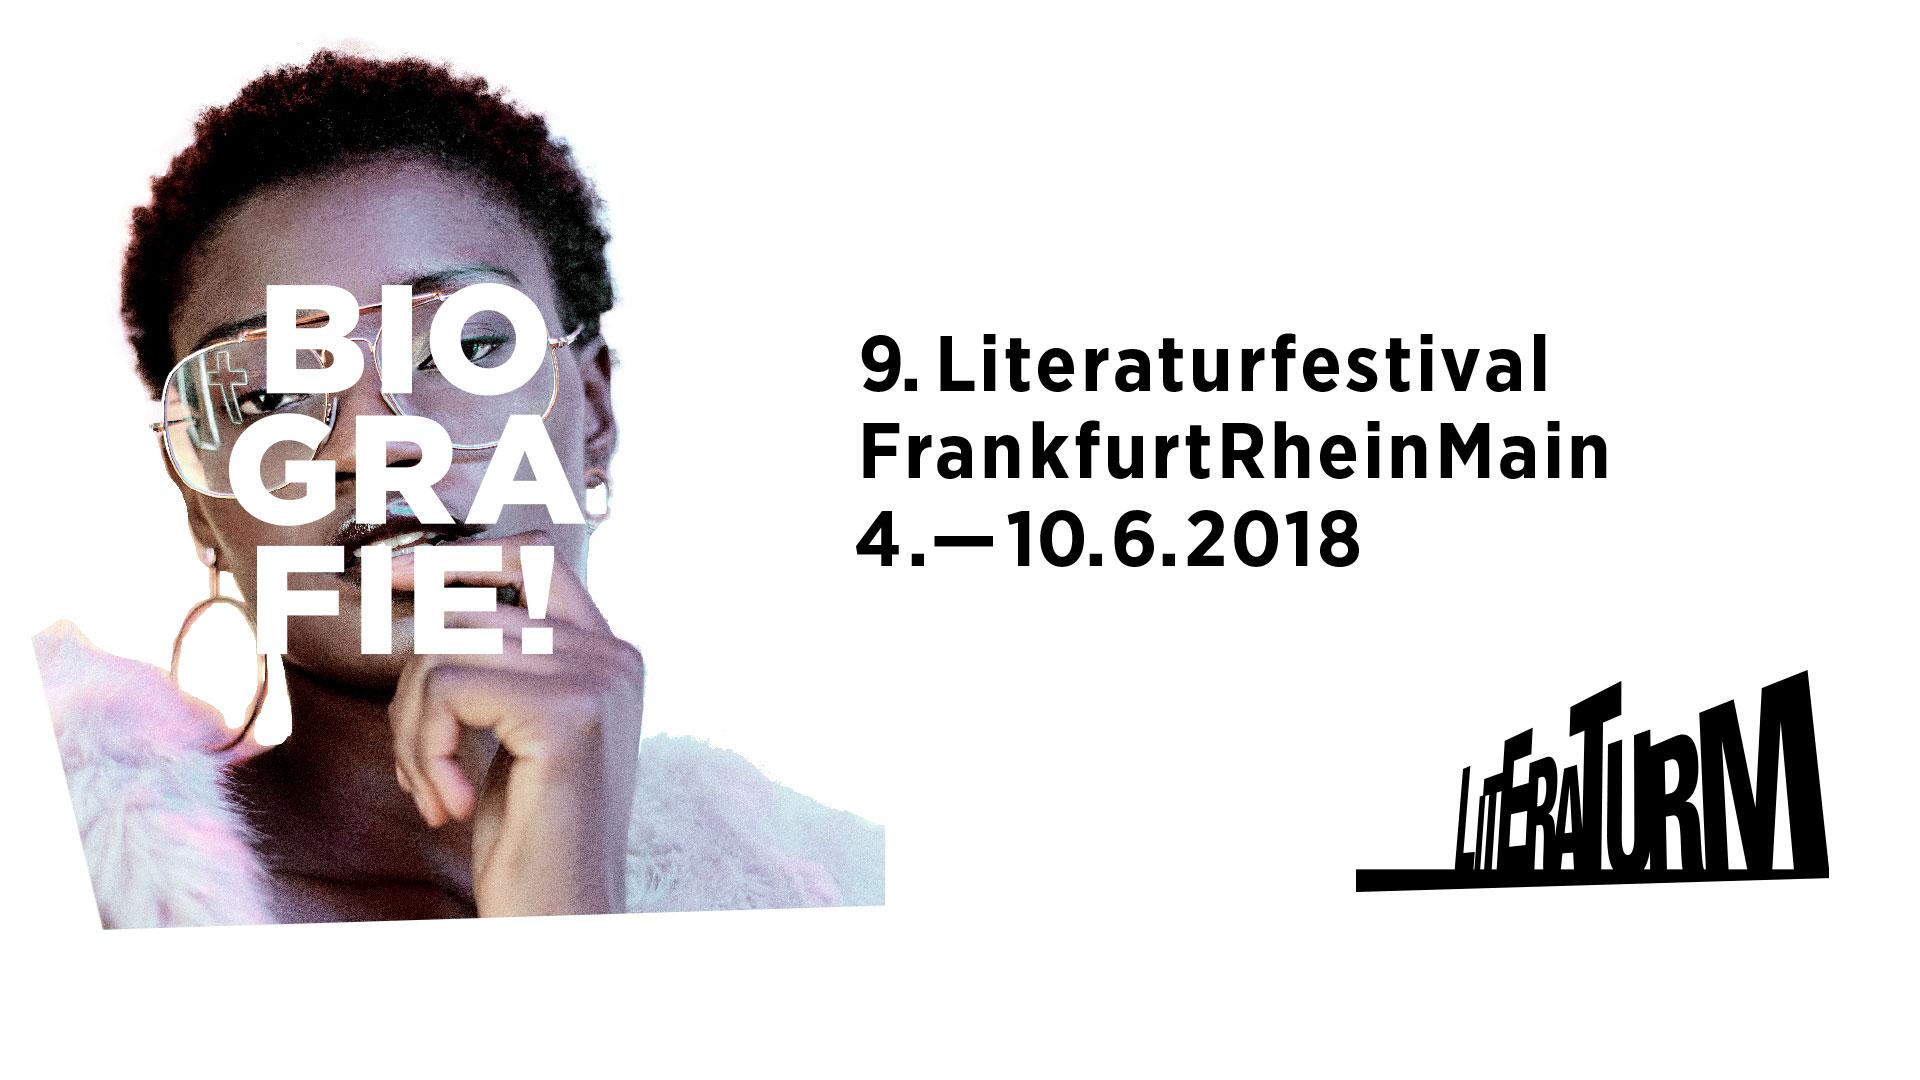 literaTurm 2018 - 9. Literaturfestival FrankfurtRheinMain